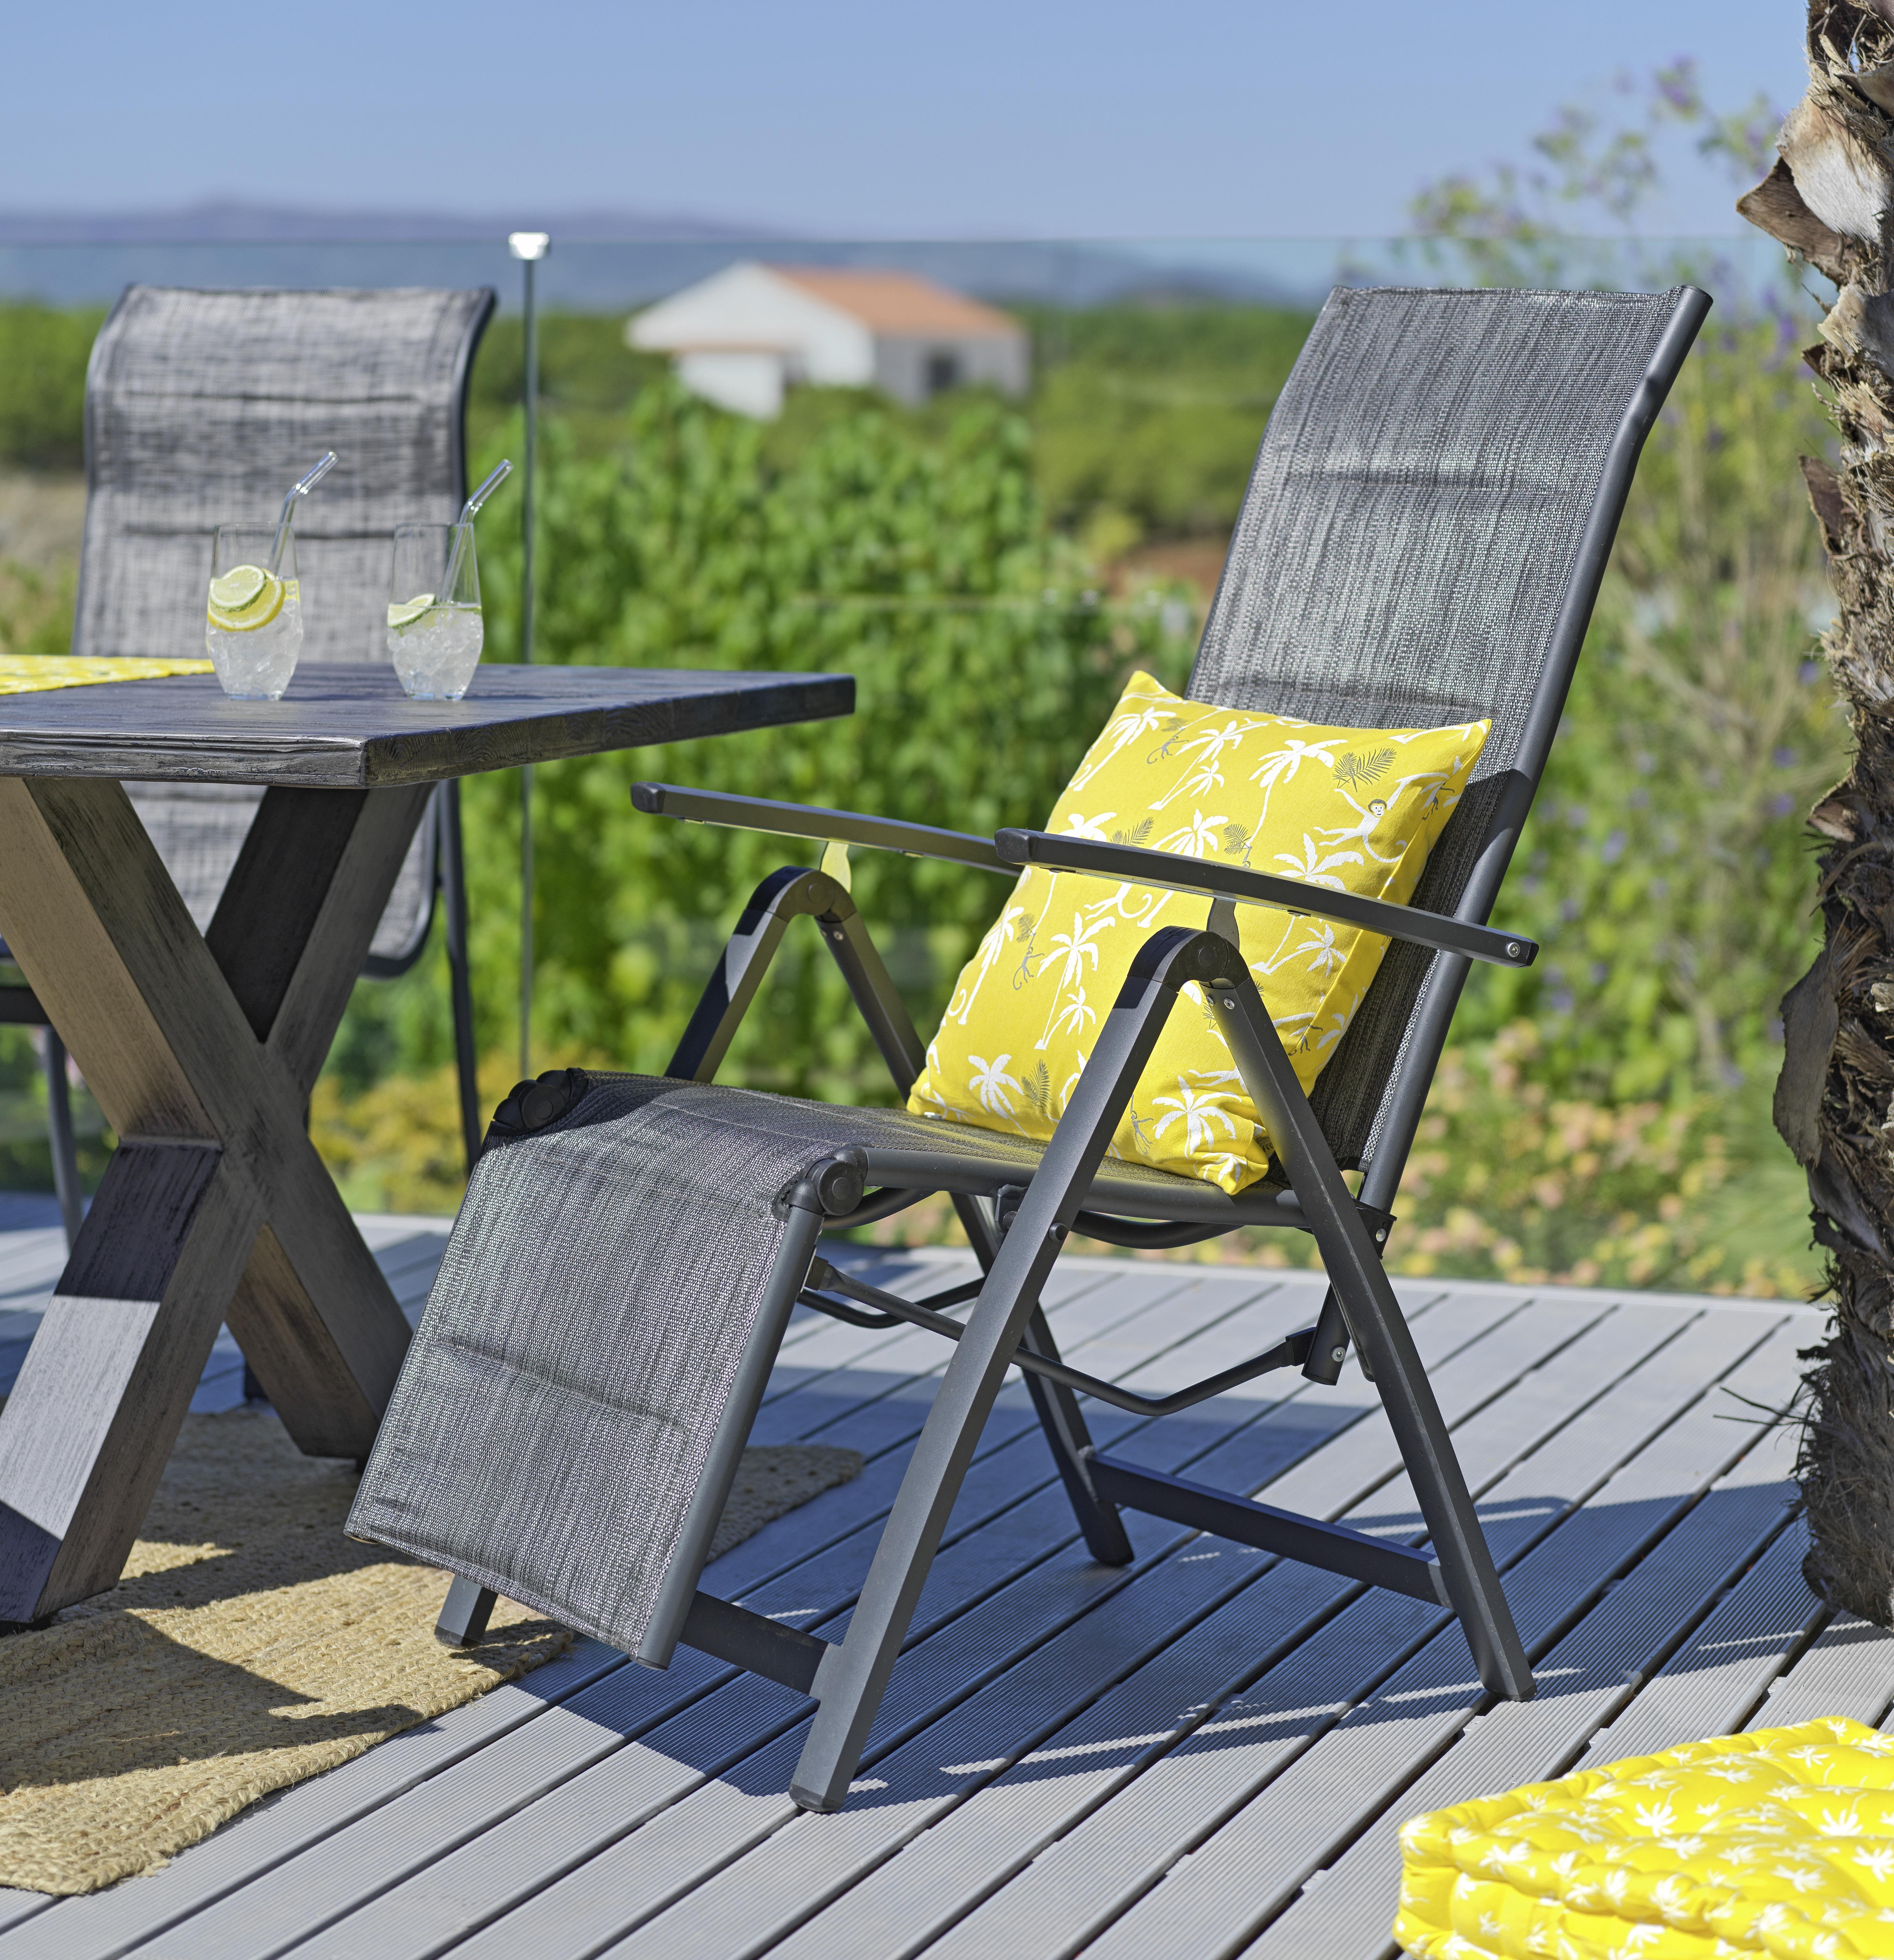 Garten Relaxsessel Aus Textilene Jetzt Bestellen